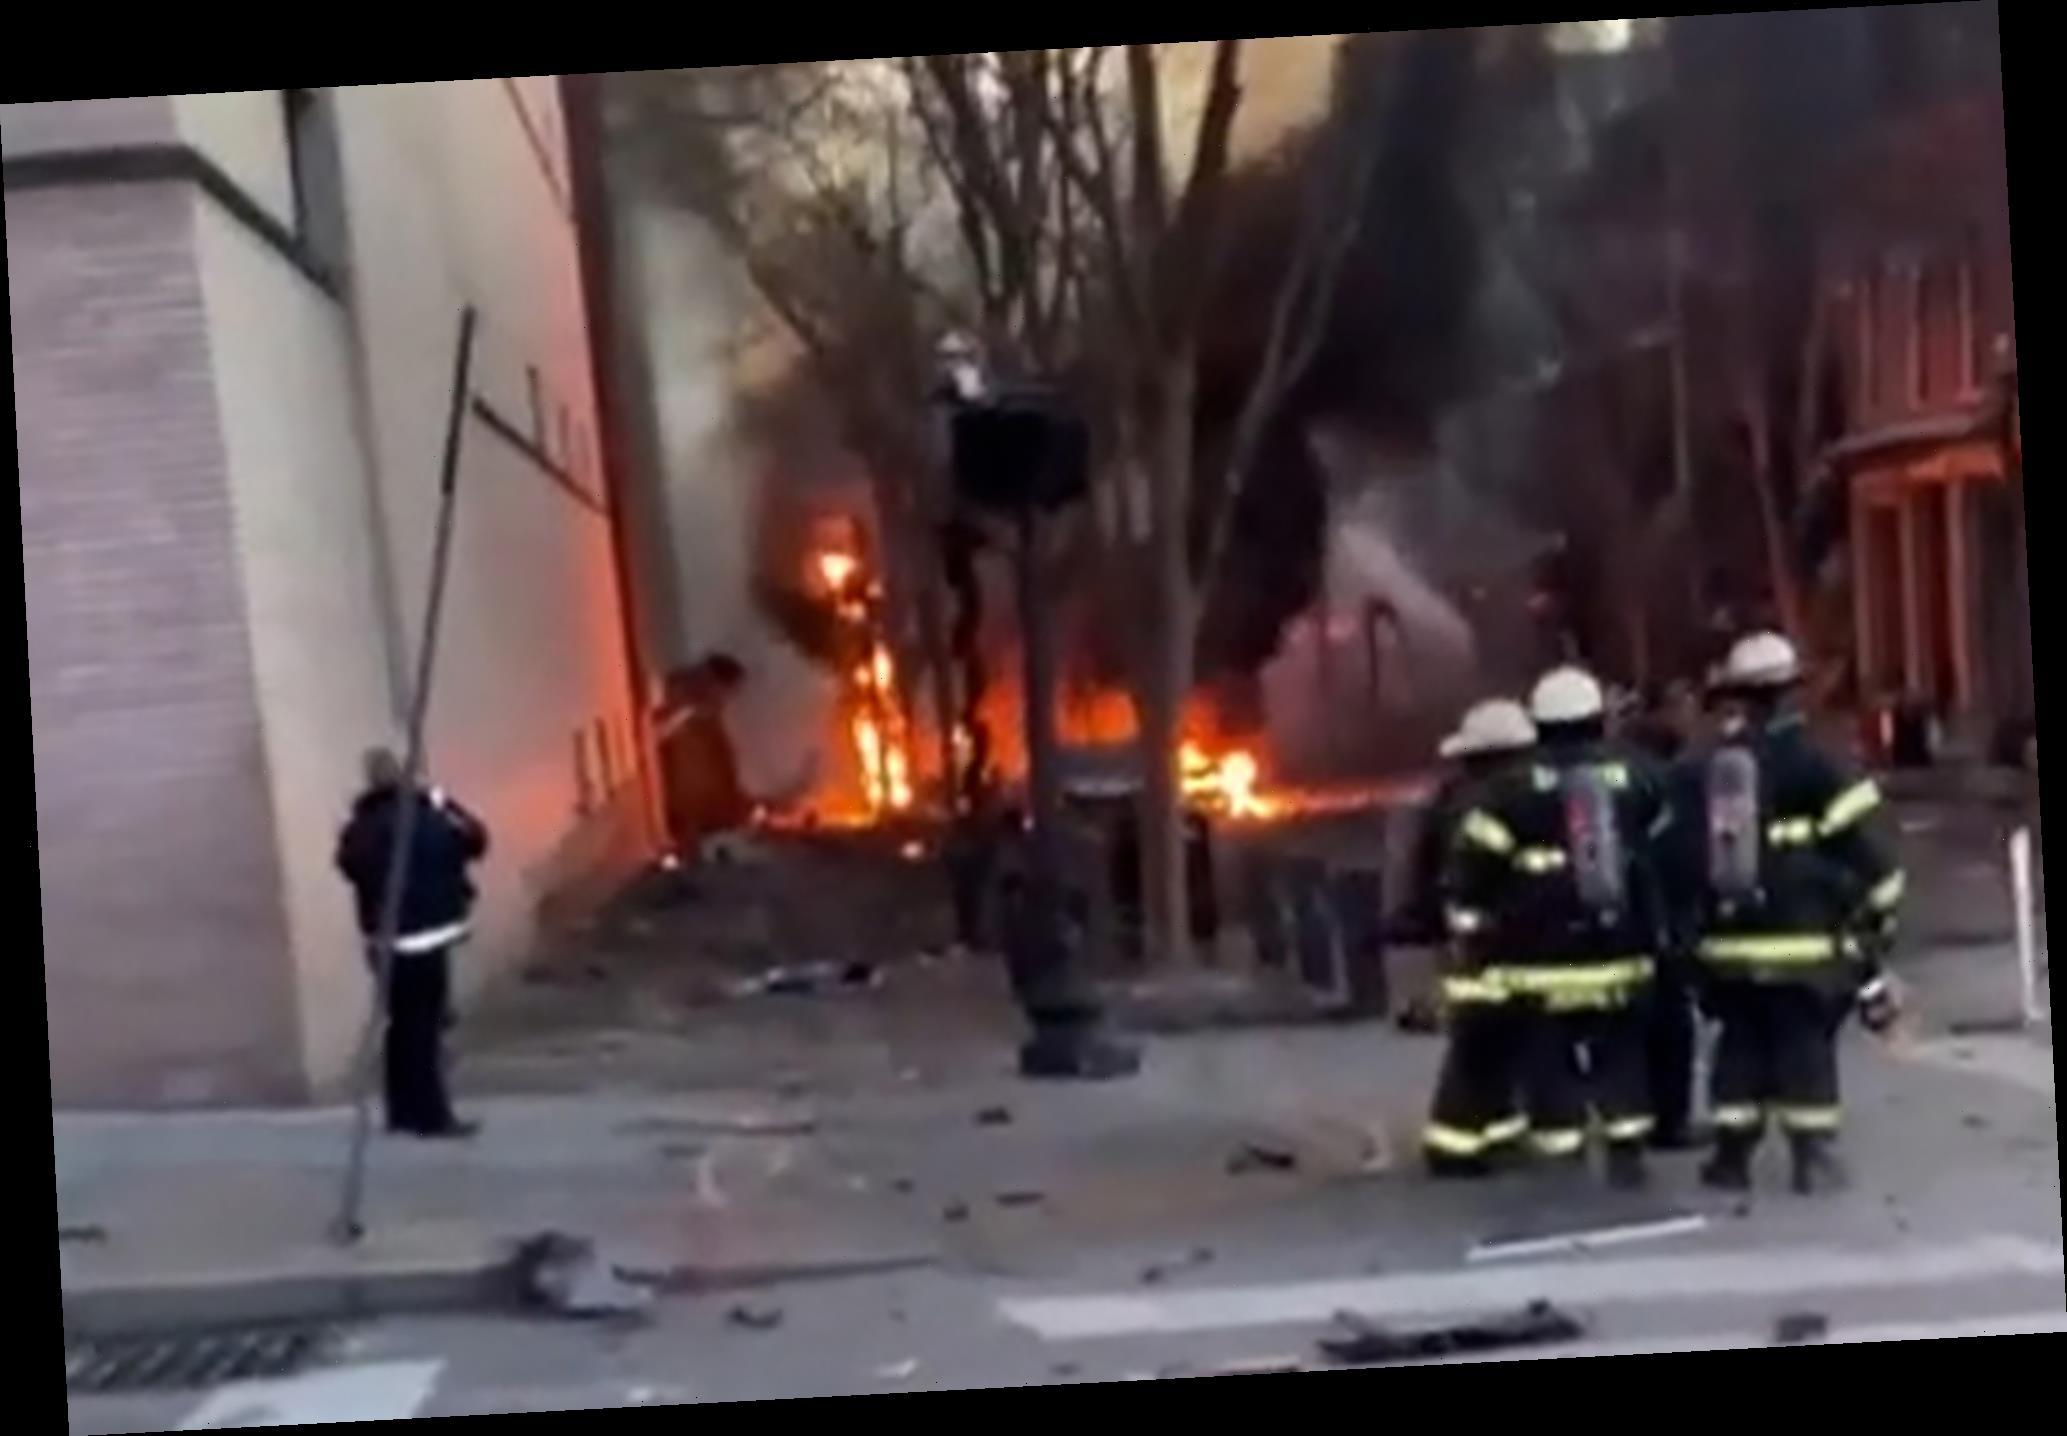 Distressing videos show devastation from Nashville explosion